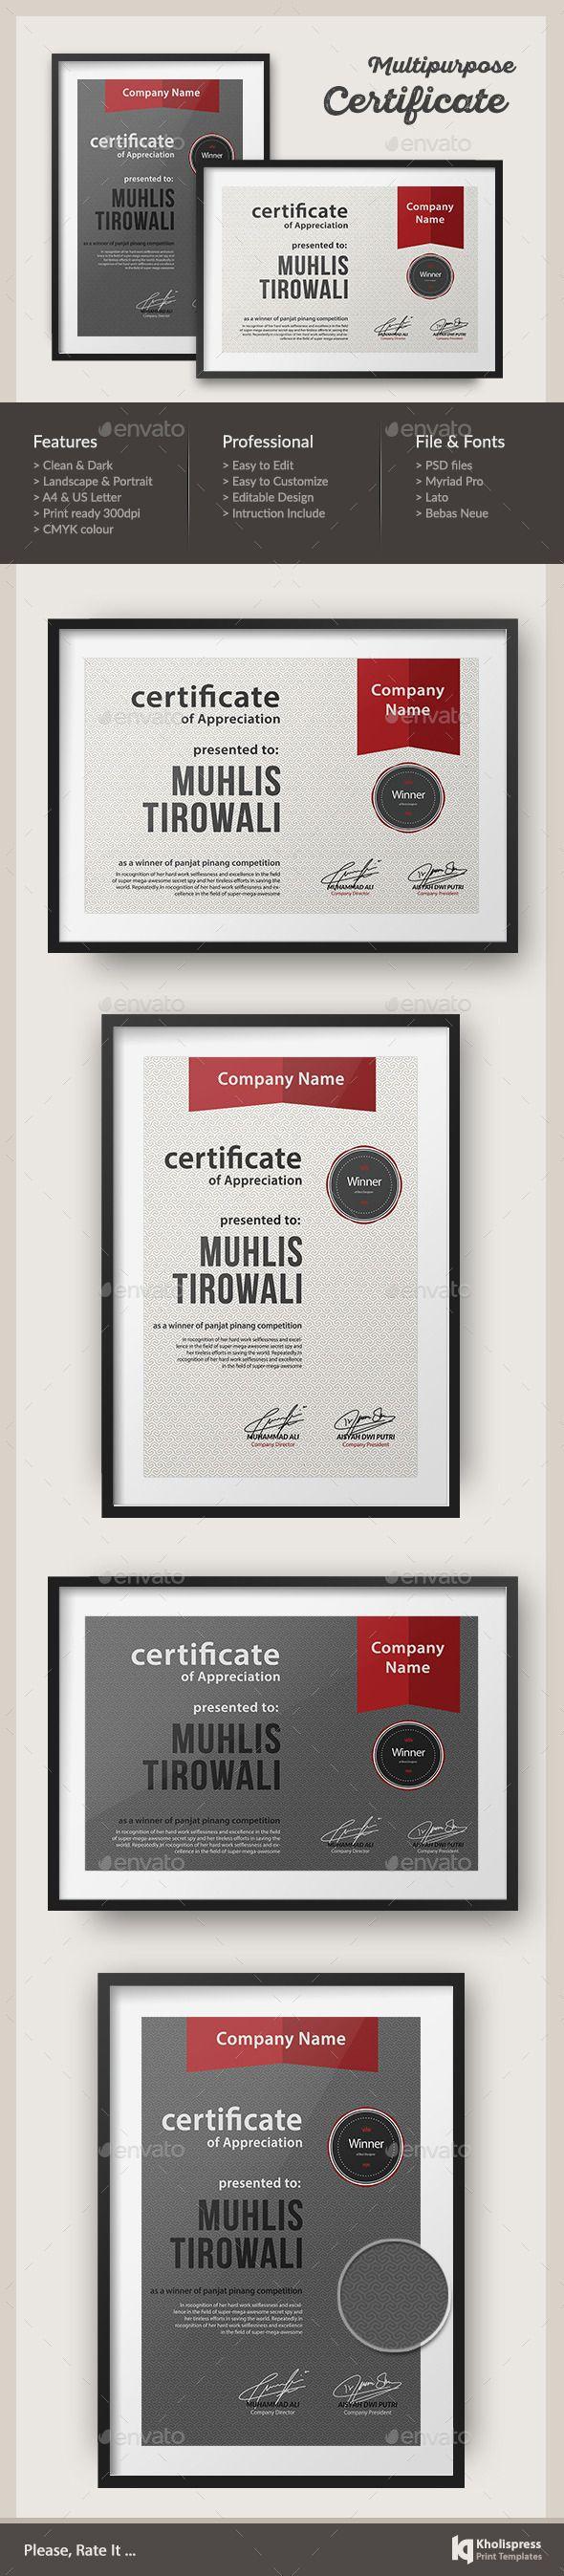 retirement certificate templates